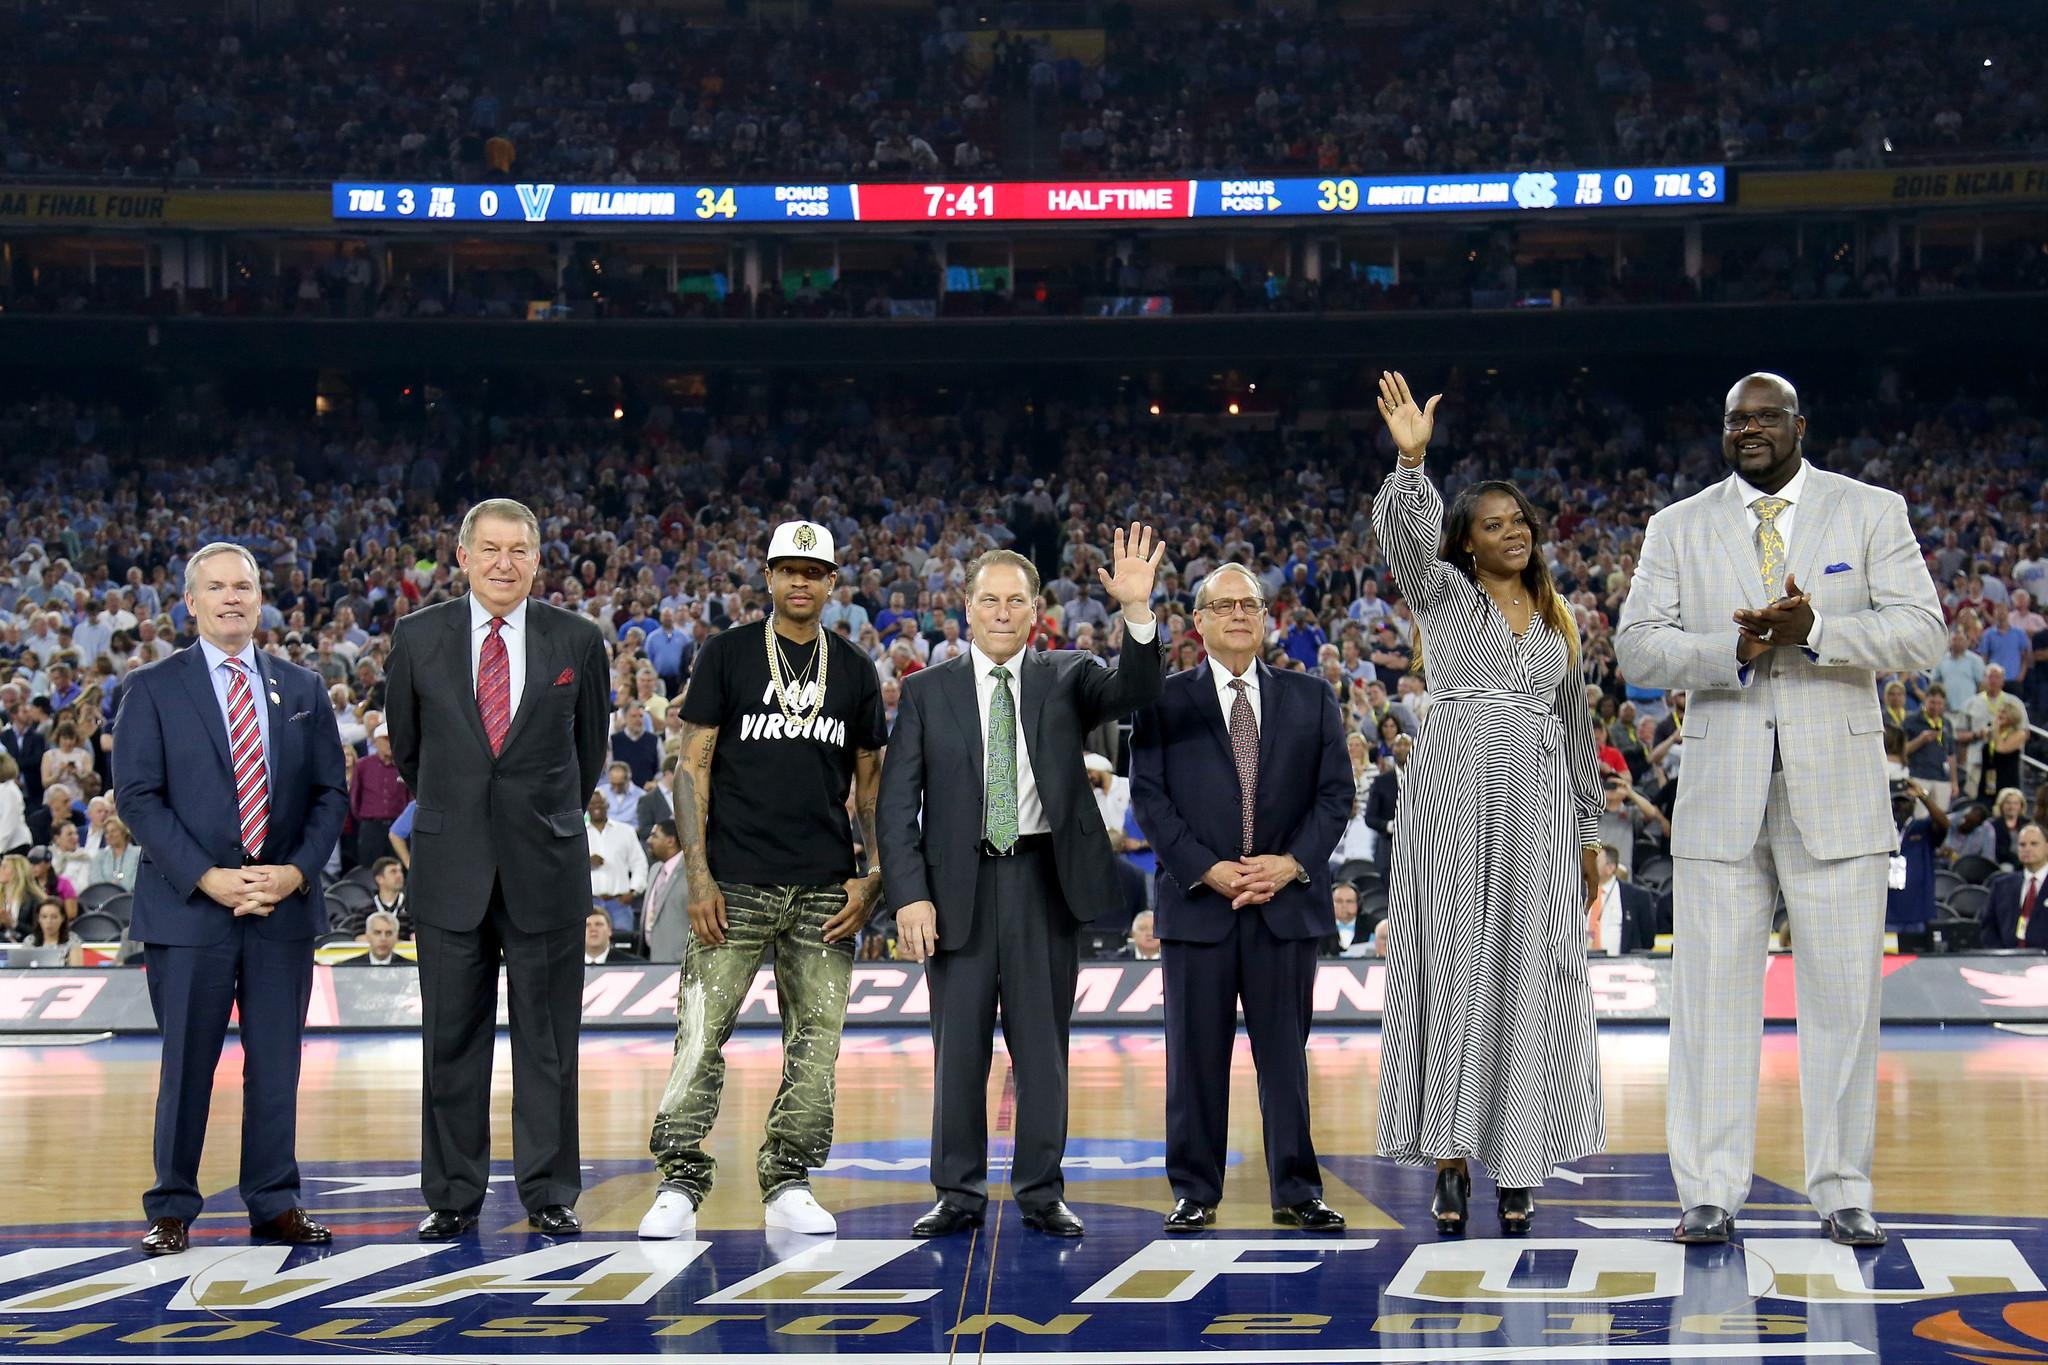 Ct-basketball-hall-of-fame-votes-feinstein-20160522